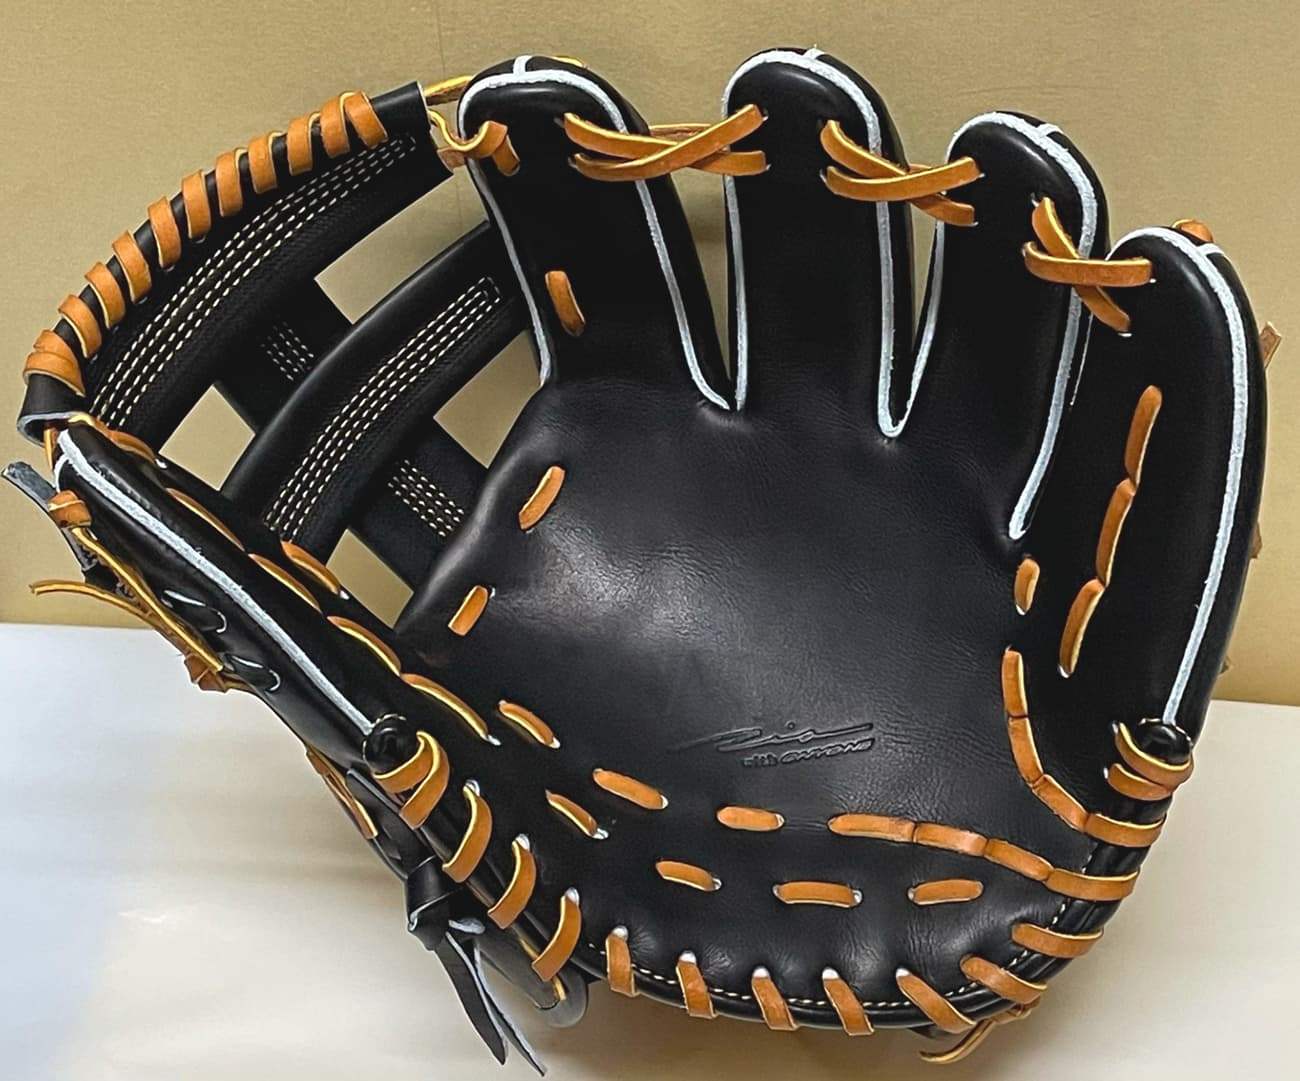 【IPセレクト】【十河モデル】硬式野球用グラブ(内野手・Luxury Collection 限定)捕球面